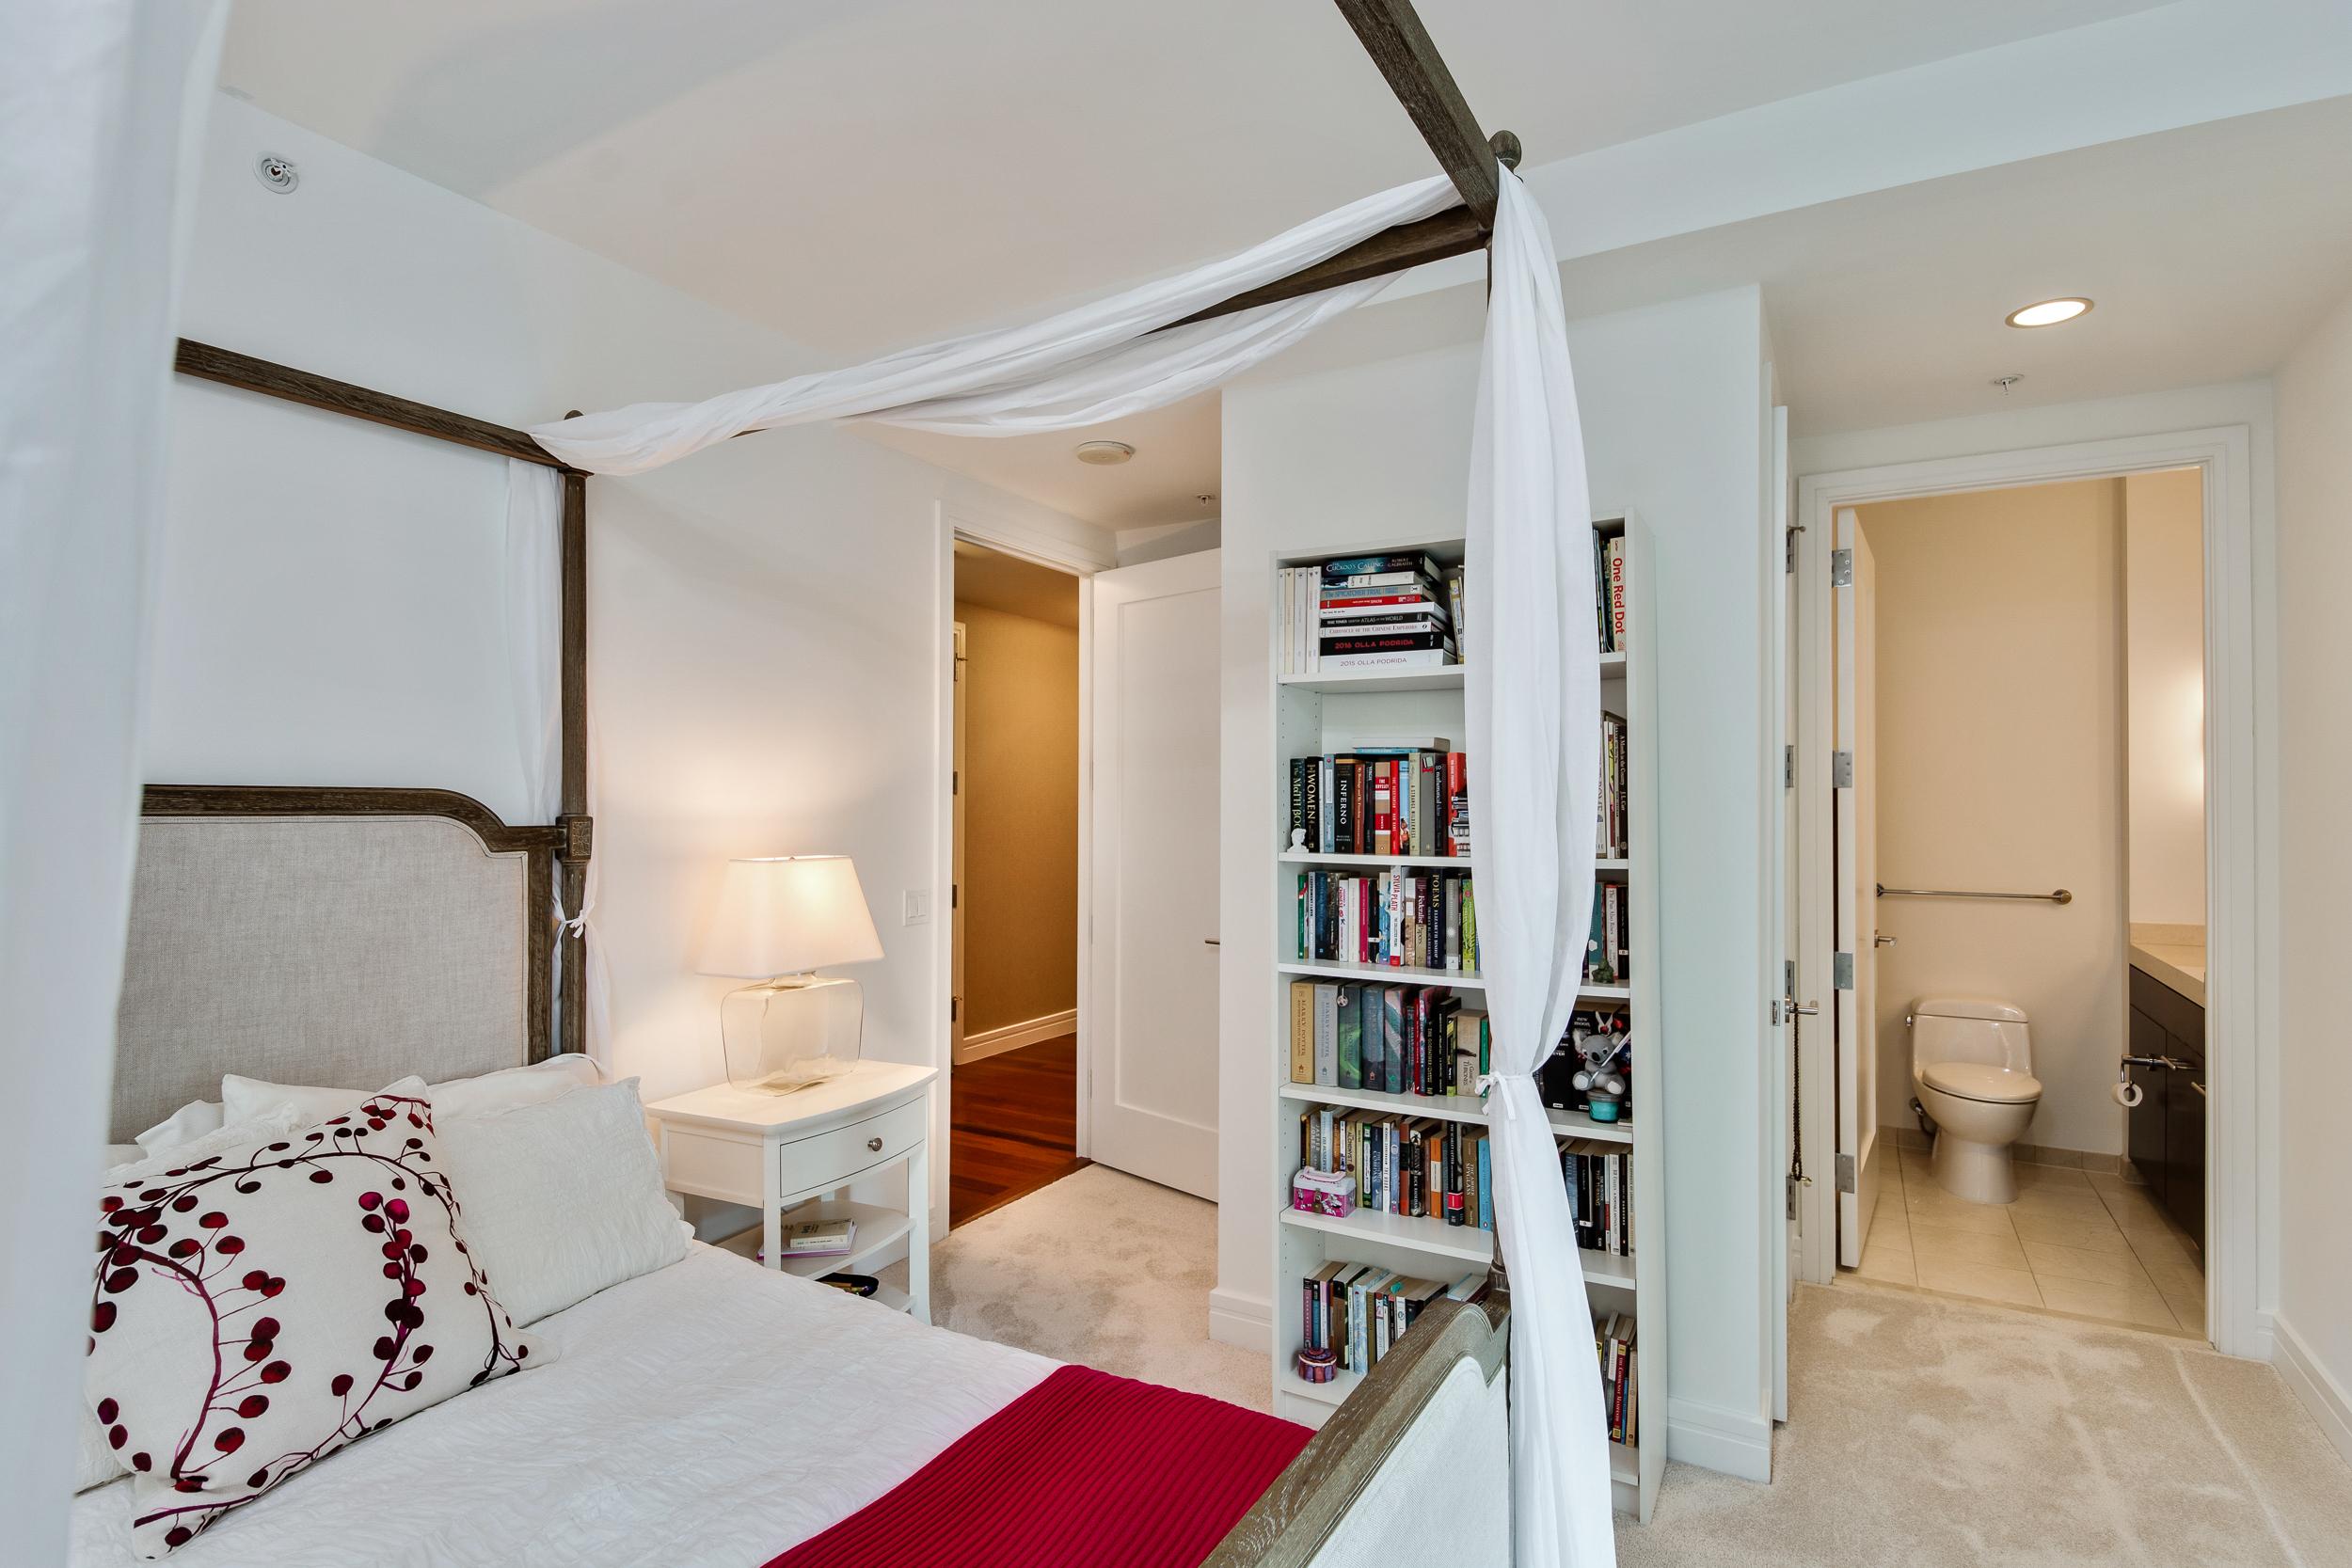 Philadelphia Luxury Home Condo-the ritz carlton residences 20H bryant wilde realty9.jpg